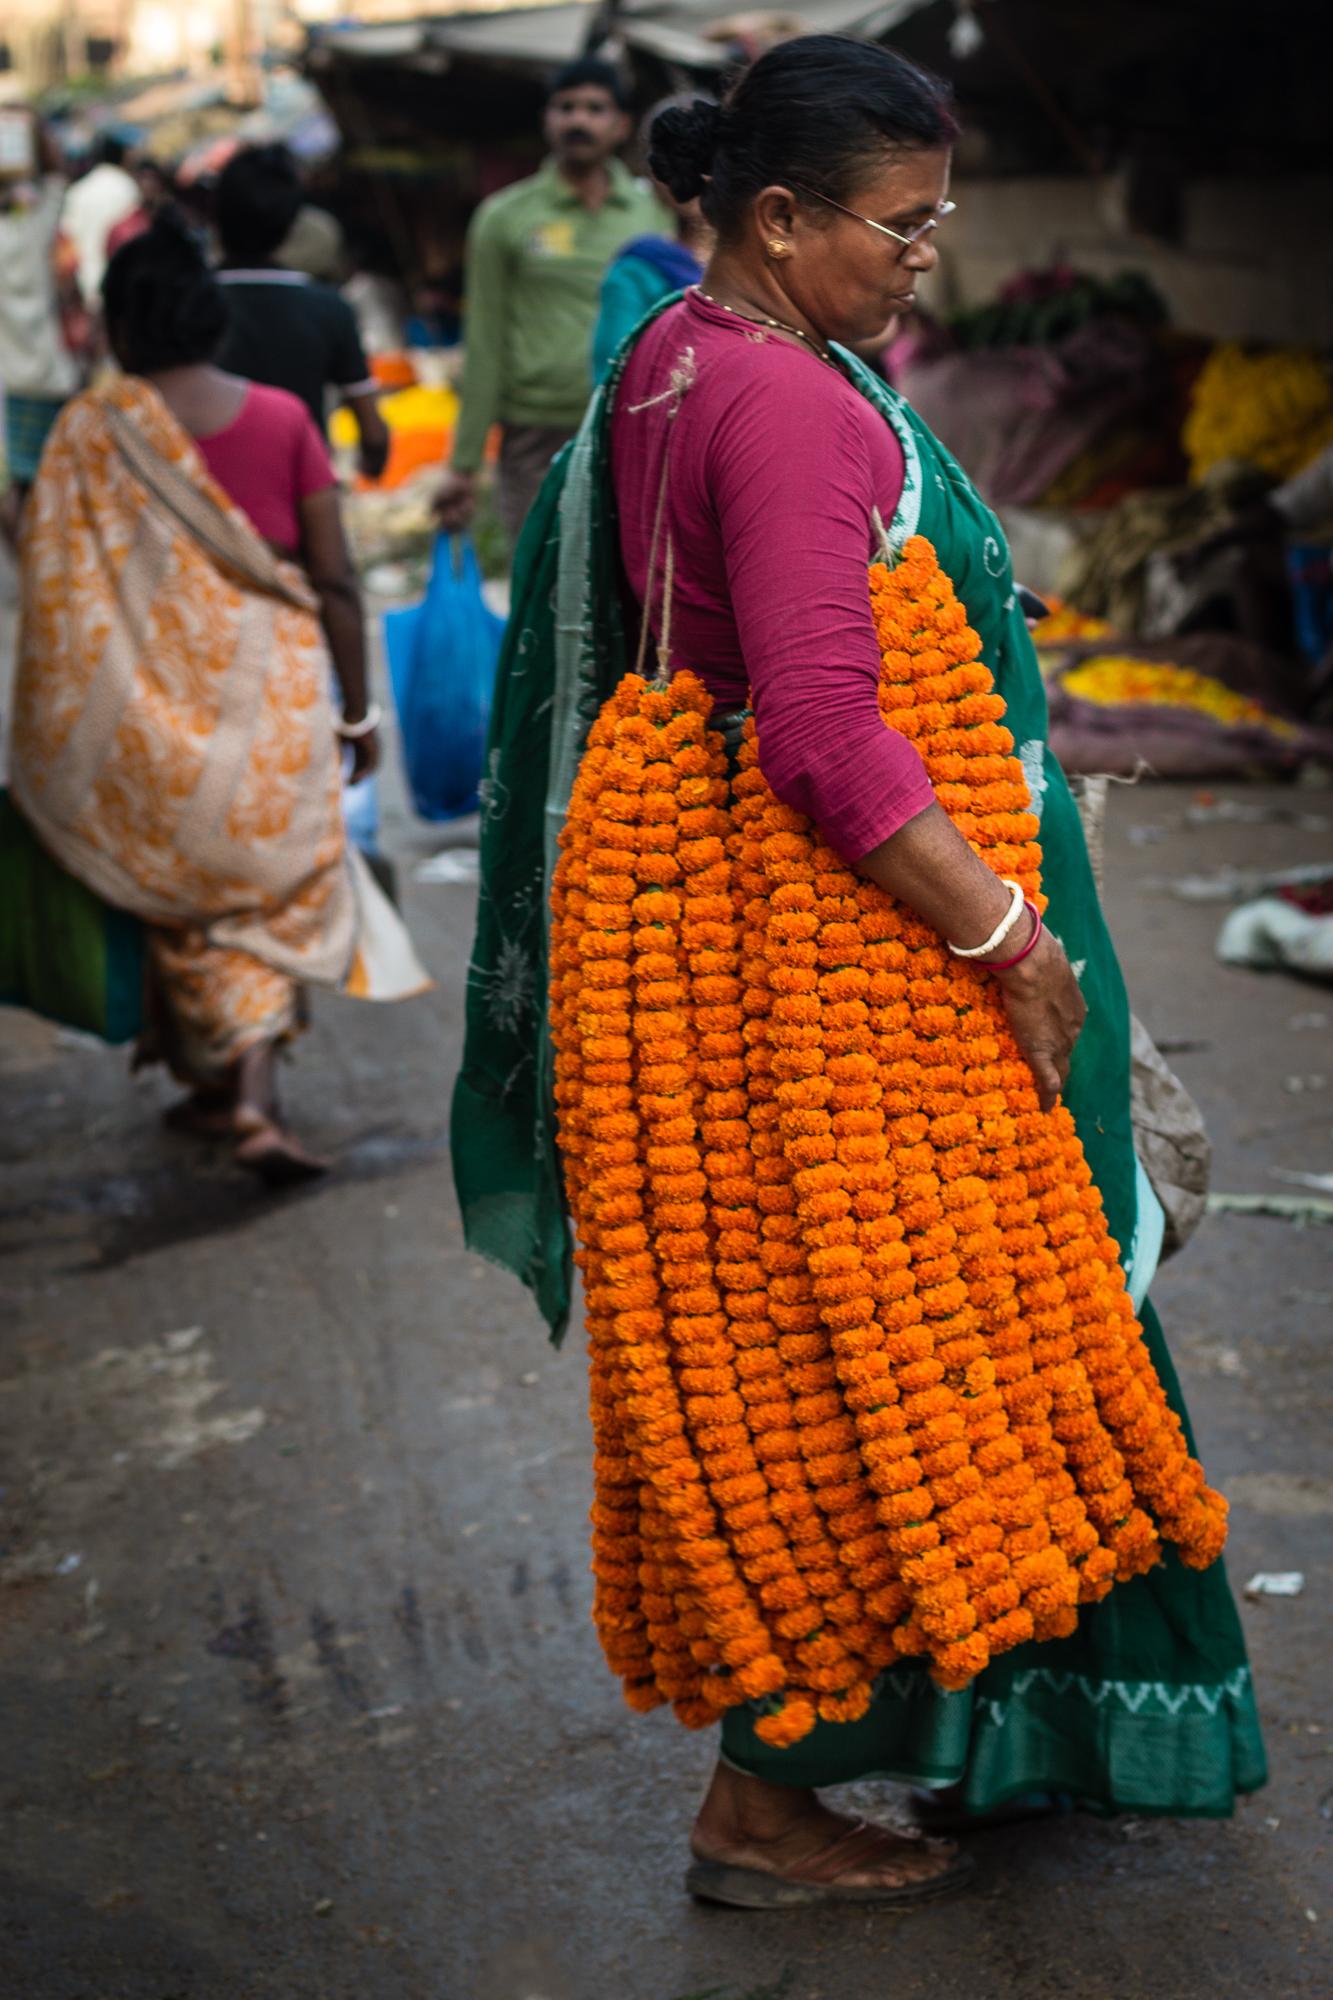 femme avec guirlandes de fleurs calcutta